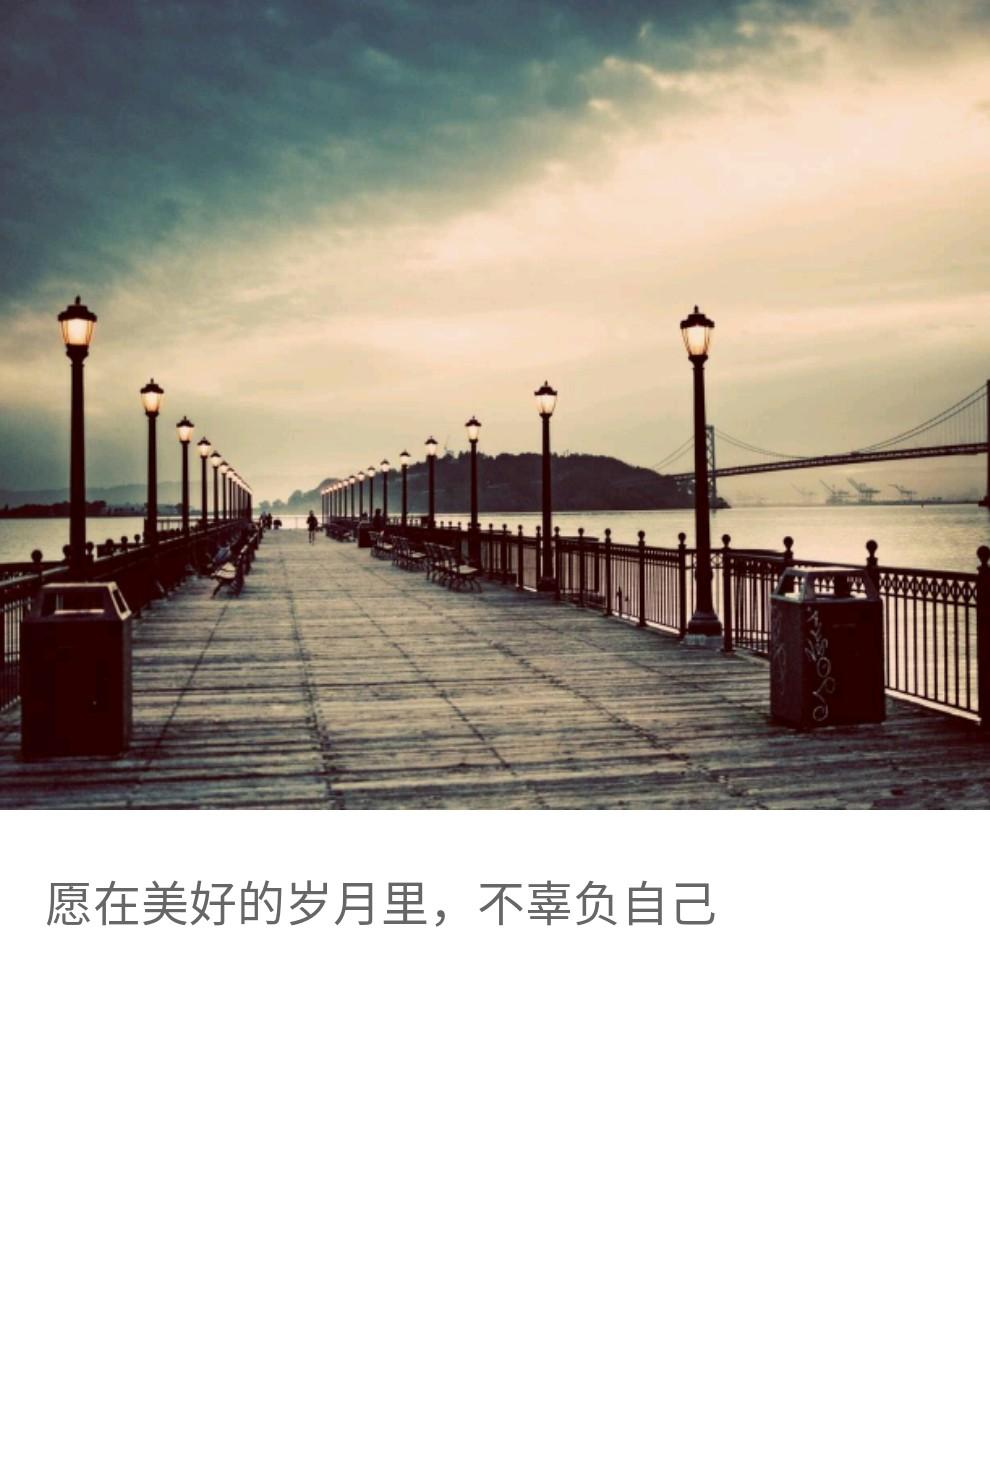 http://www.elycia-webdesign.com/pid/654060.html